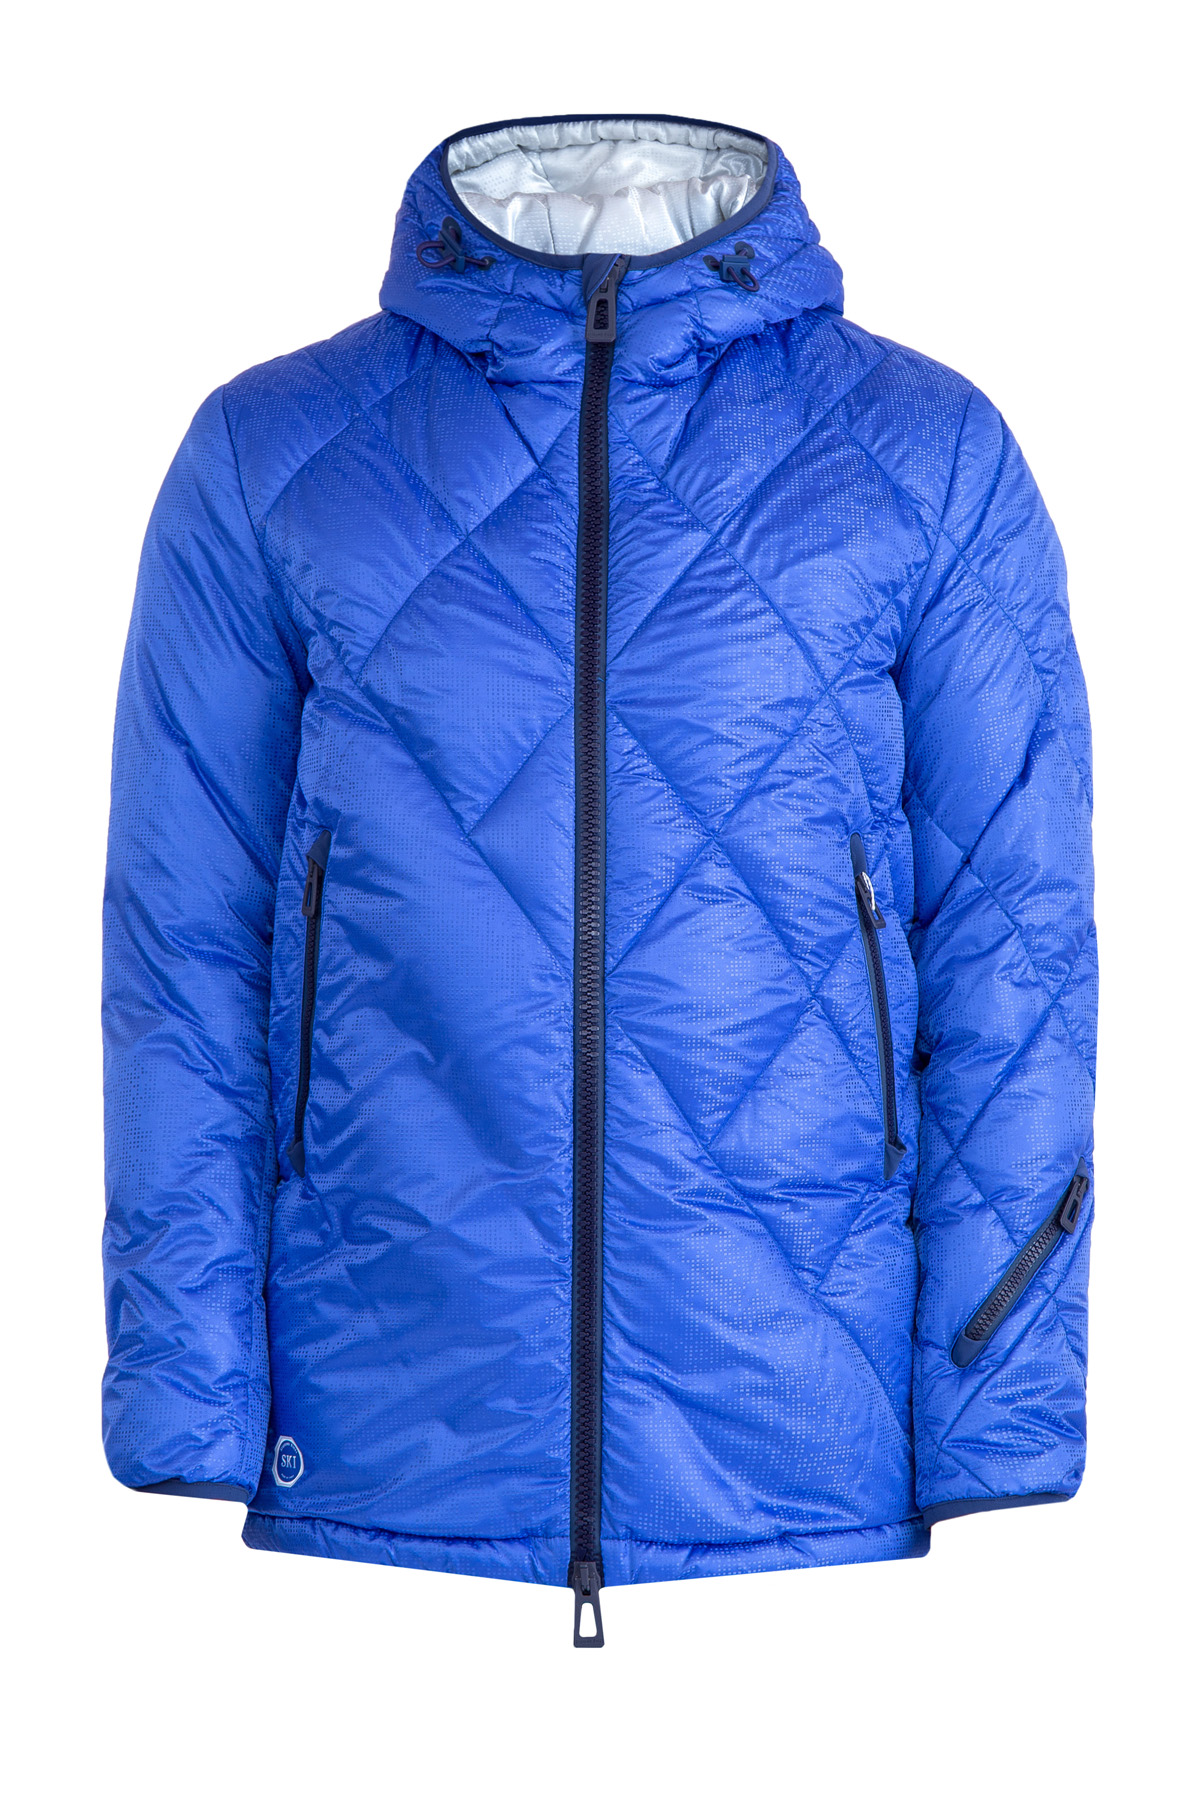 Купить Куртка, STEFANO RICCI, Италия, полиамид 90%, полиуретан 10%